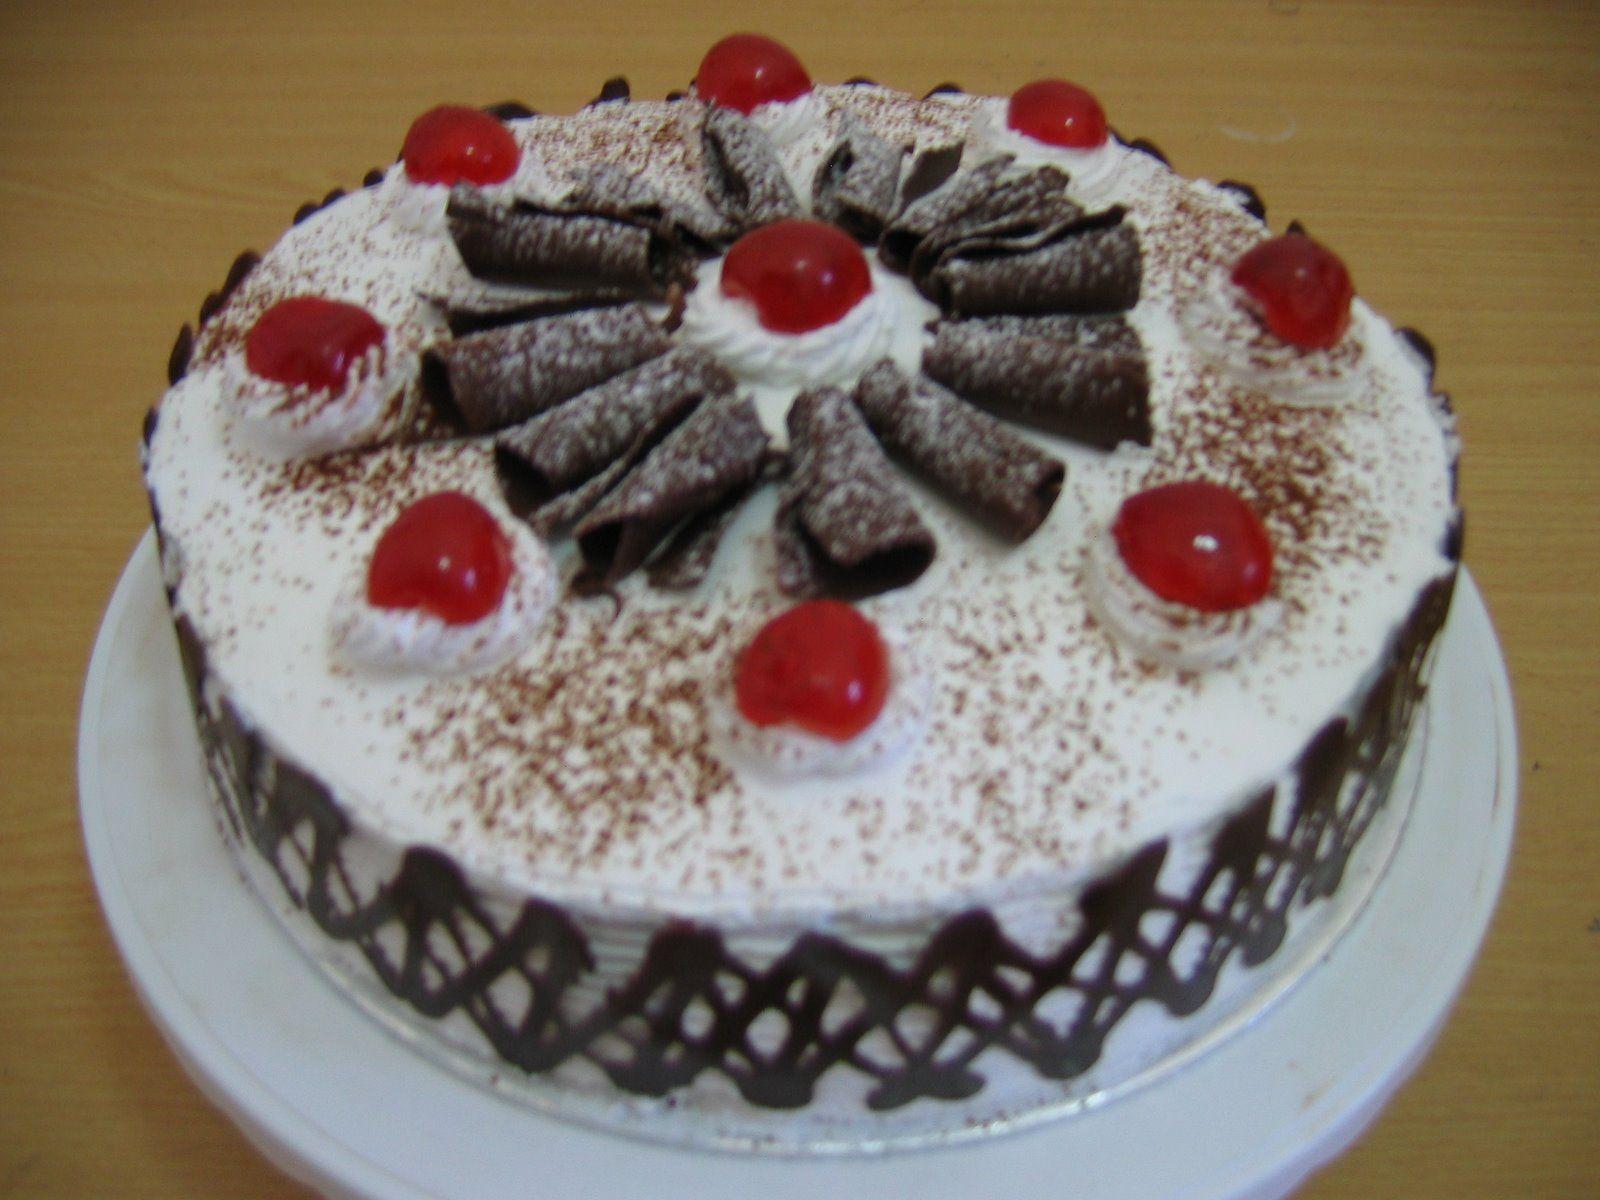 Resep Membuat Kue Tart Ulang Tahun Black Forest Sendiri Dan Mudah Kue Tart Kue Resep Kue